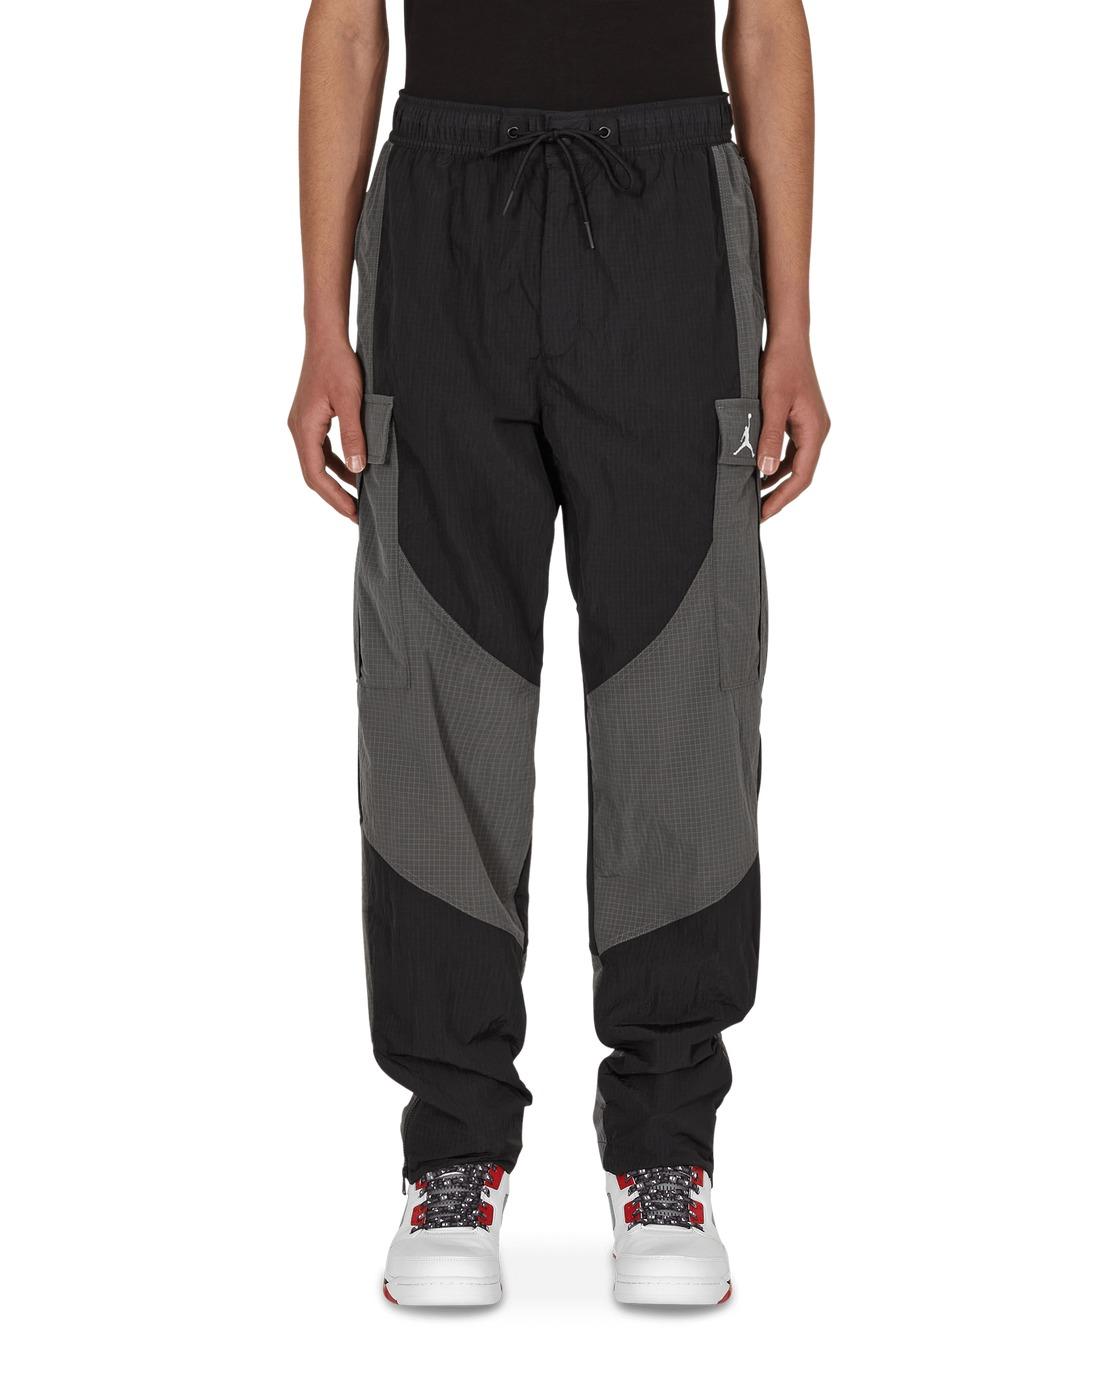 Photo: Nike Jordan 23 Engineered Woven Pants Black/Iron Grey